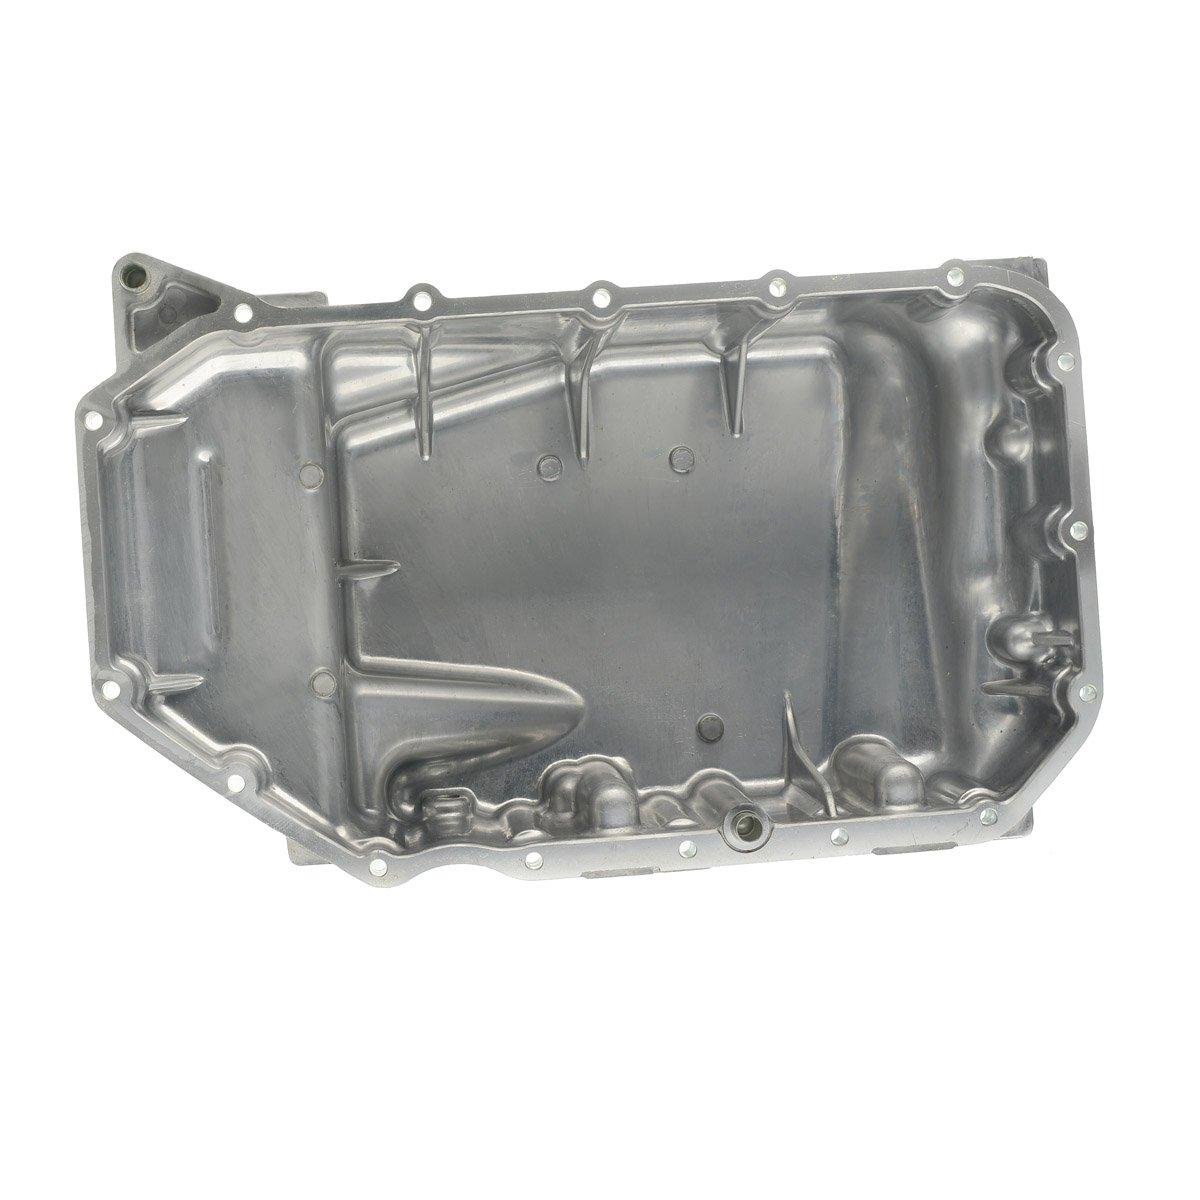 A-Premium Engine Oil Pan for Honda CR-V 2007-2009 l4 2.4L Sport Utility